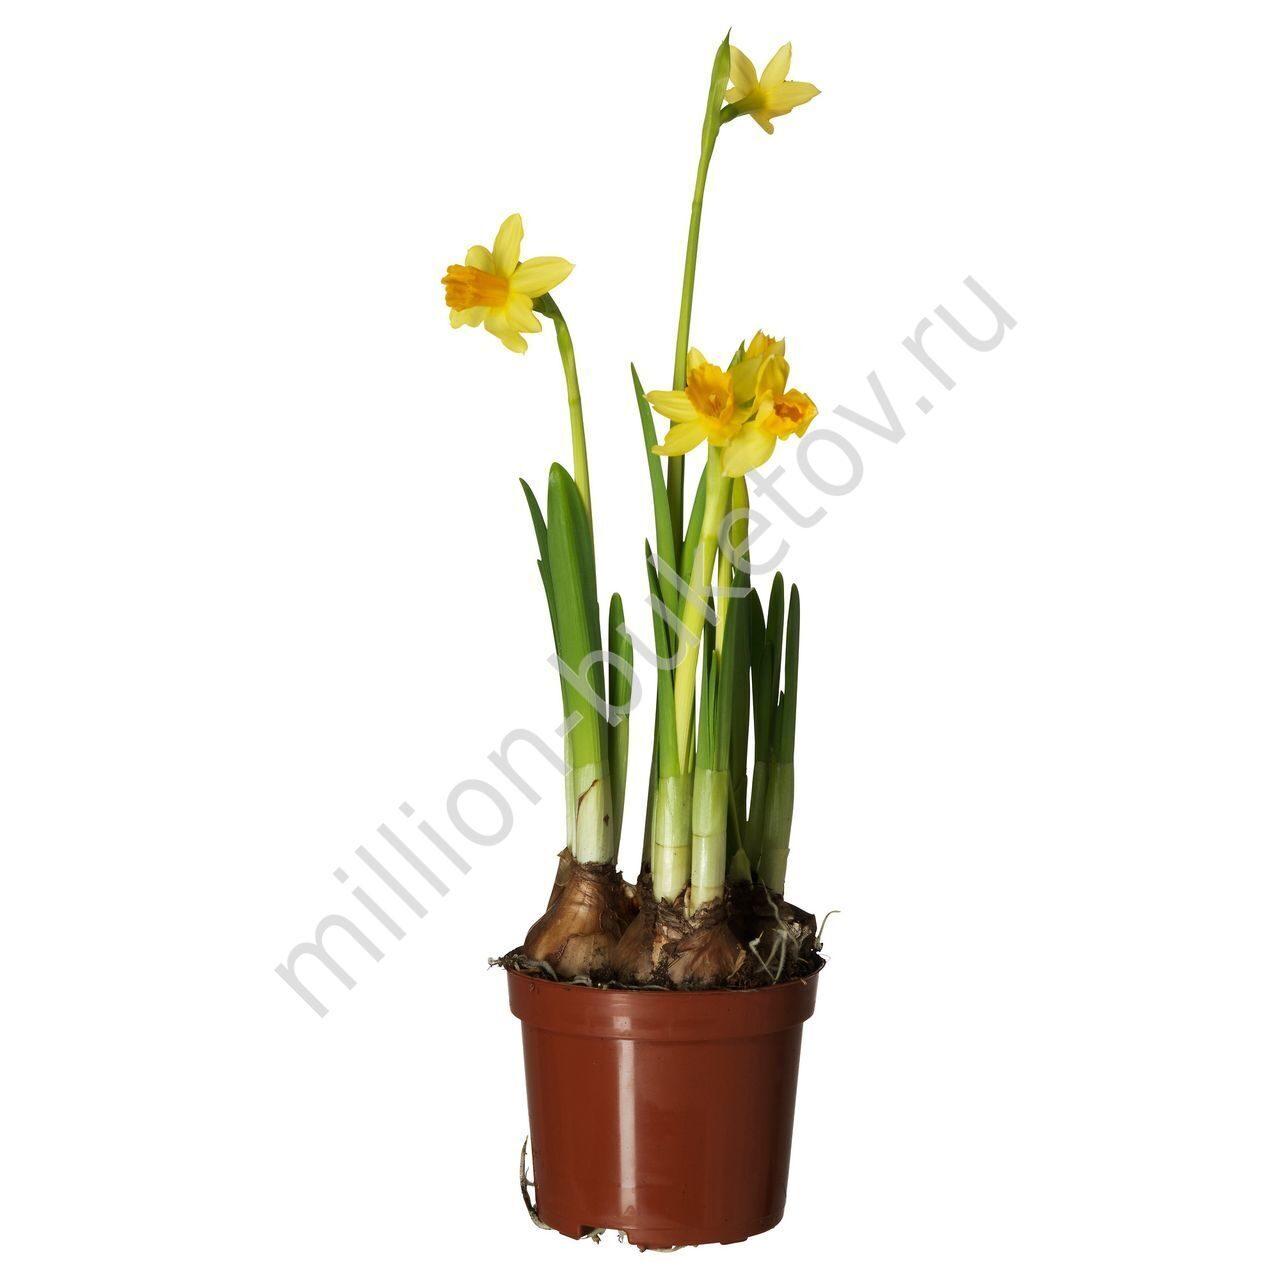 Домашний цветок похожий на нарцисс как